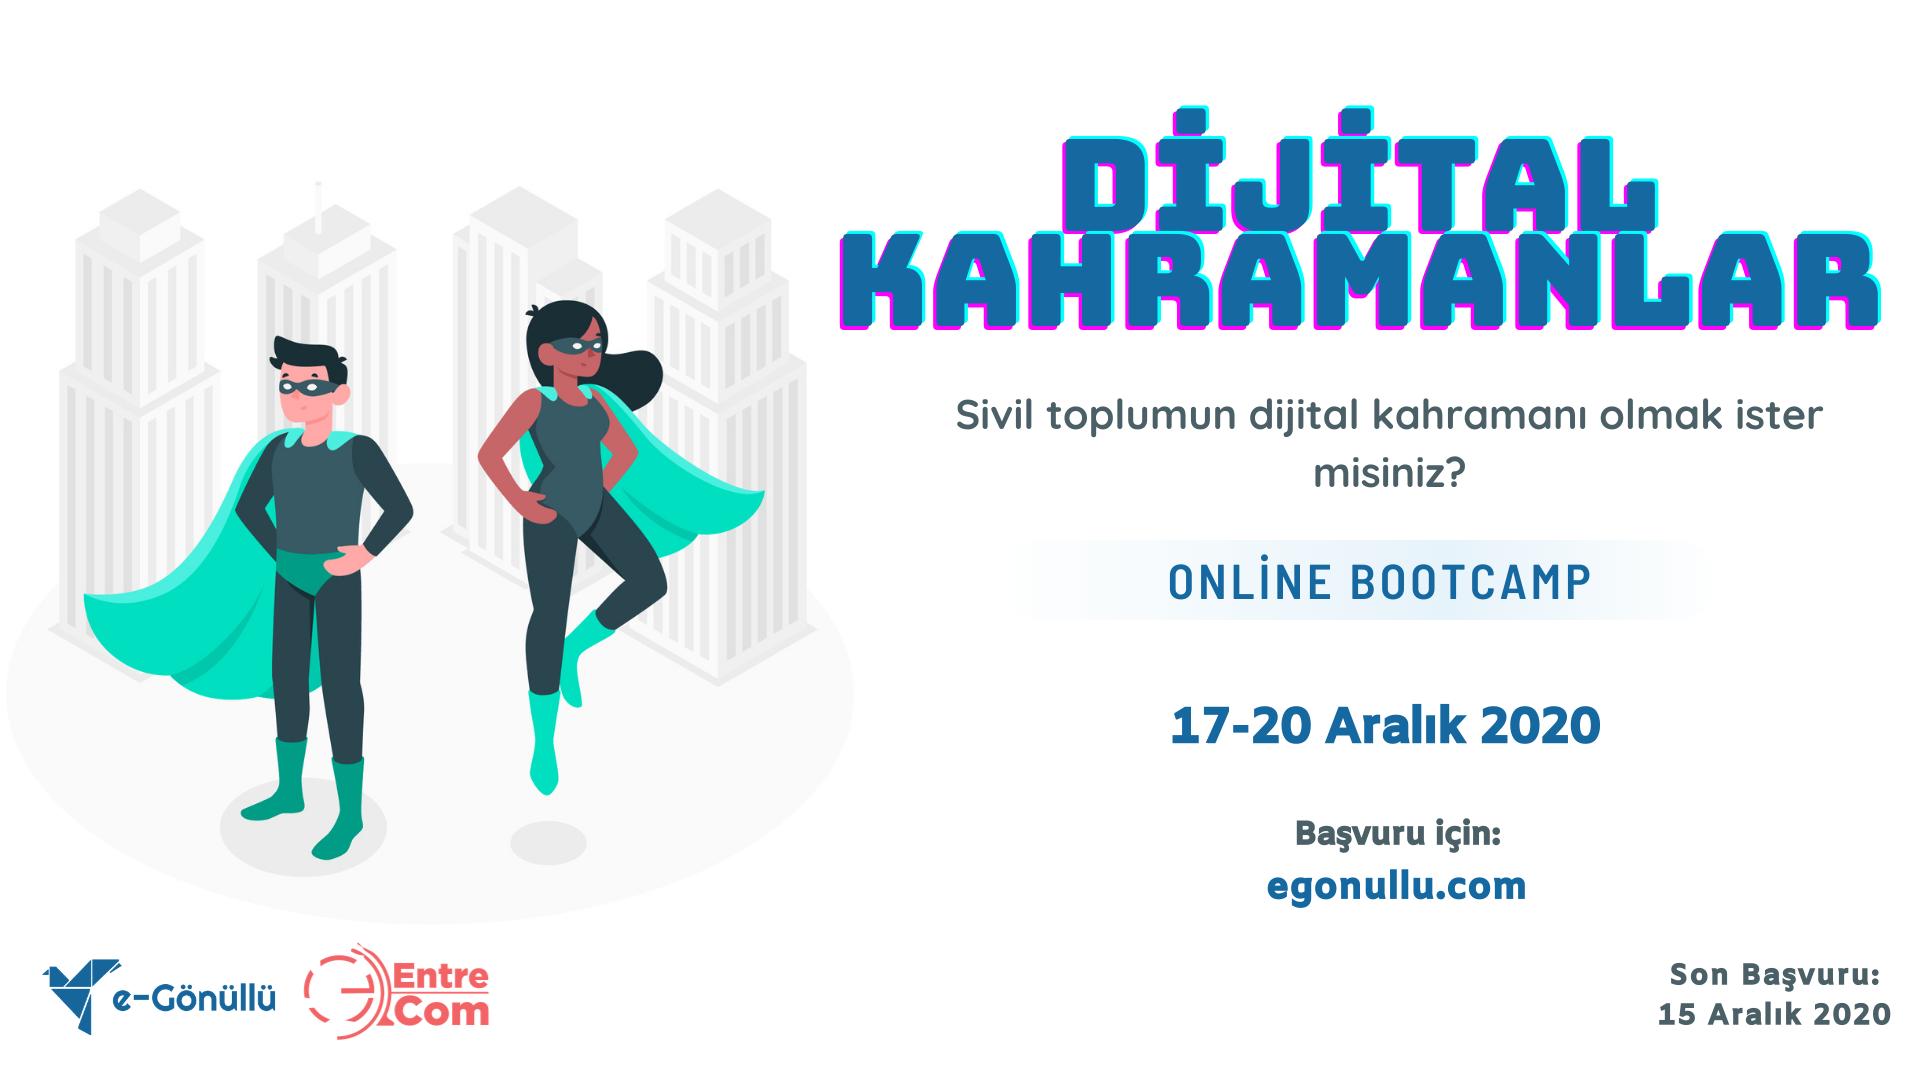 Dijital Kahramanlar Bootcamp